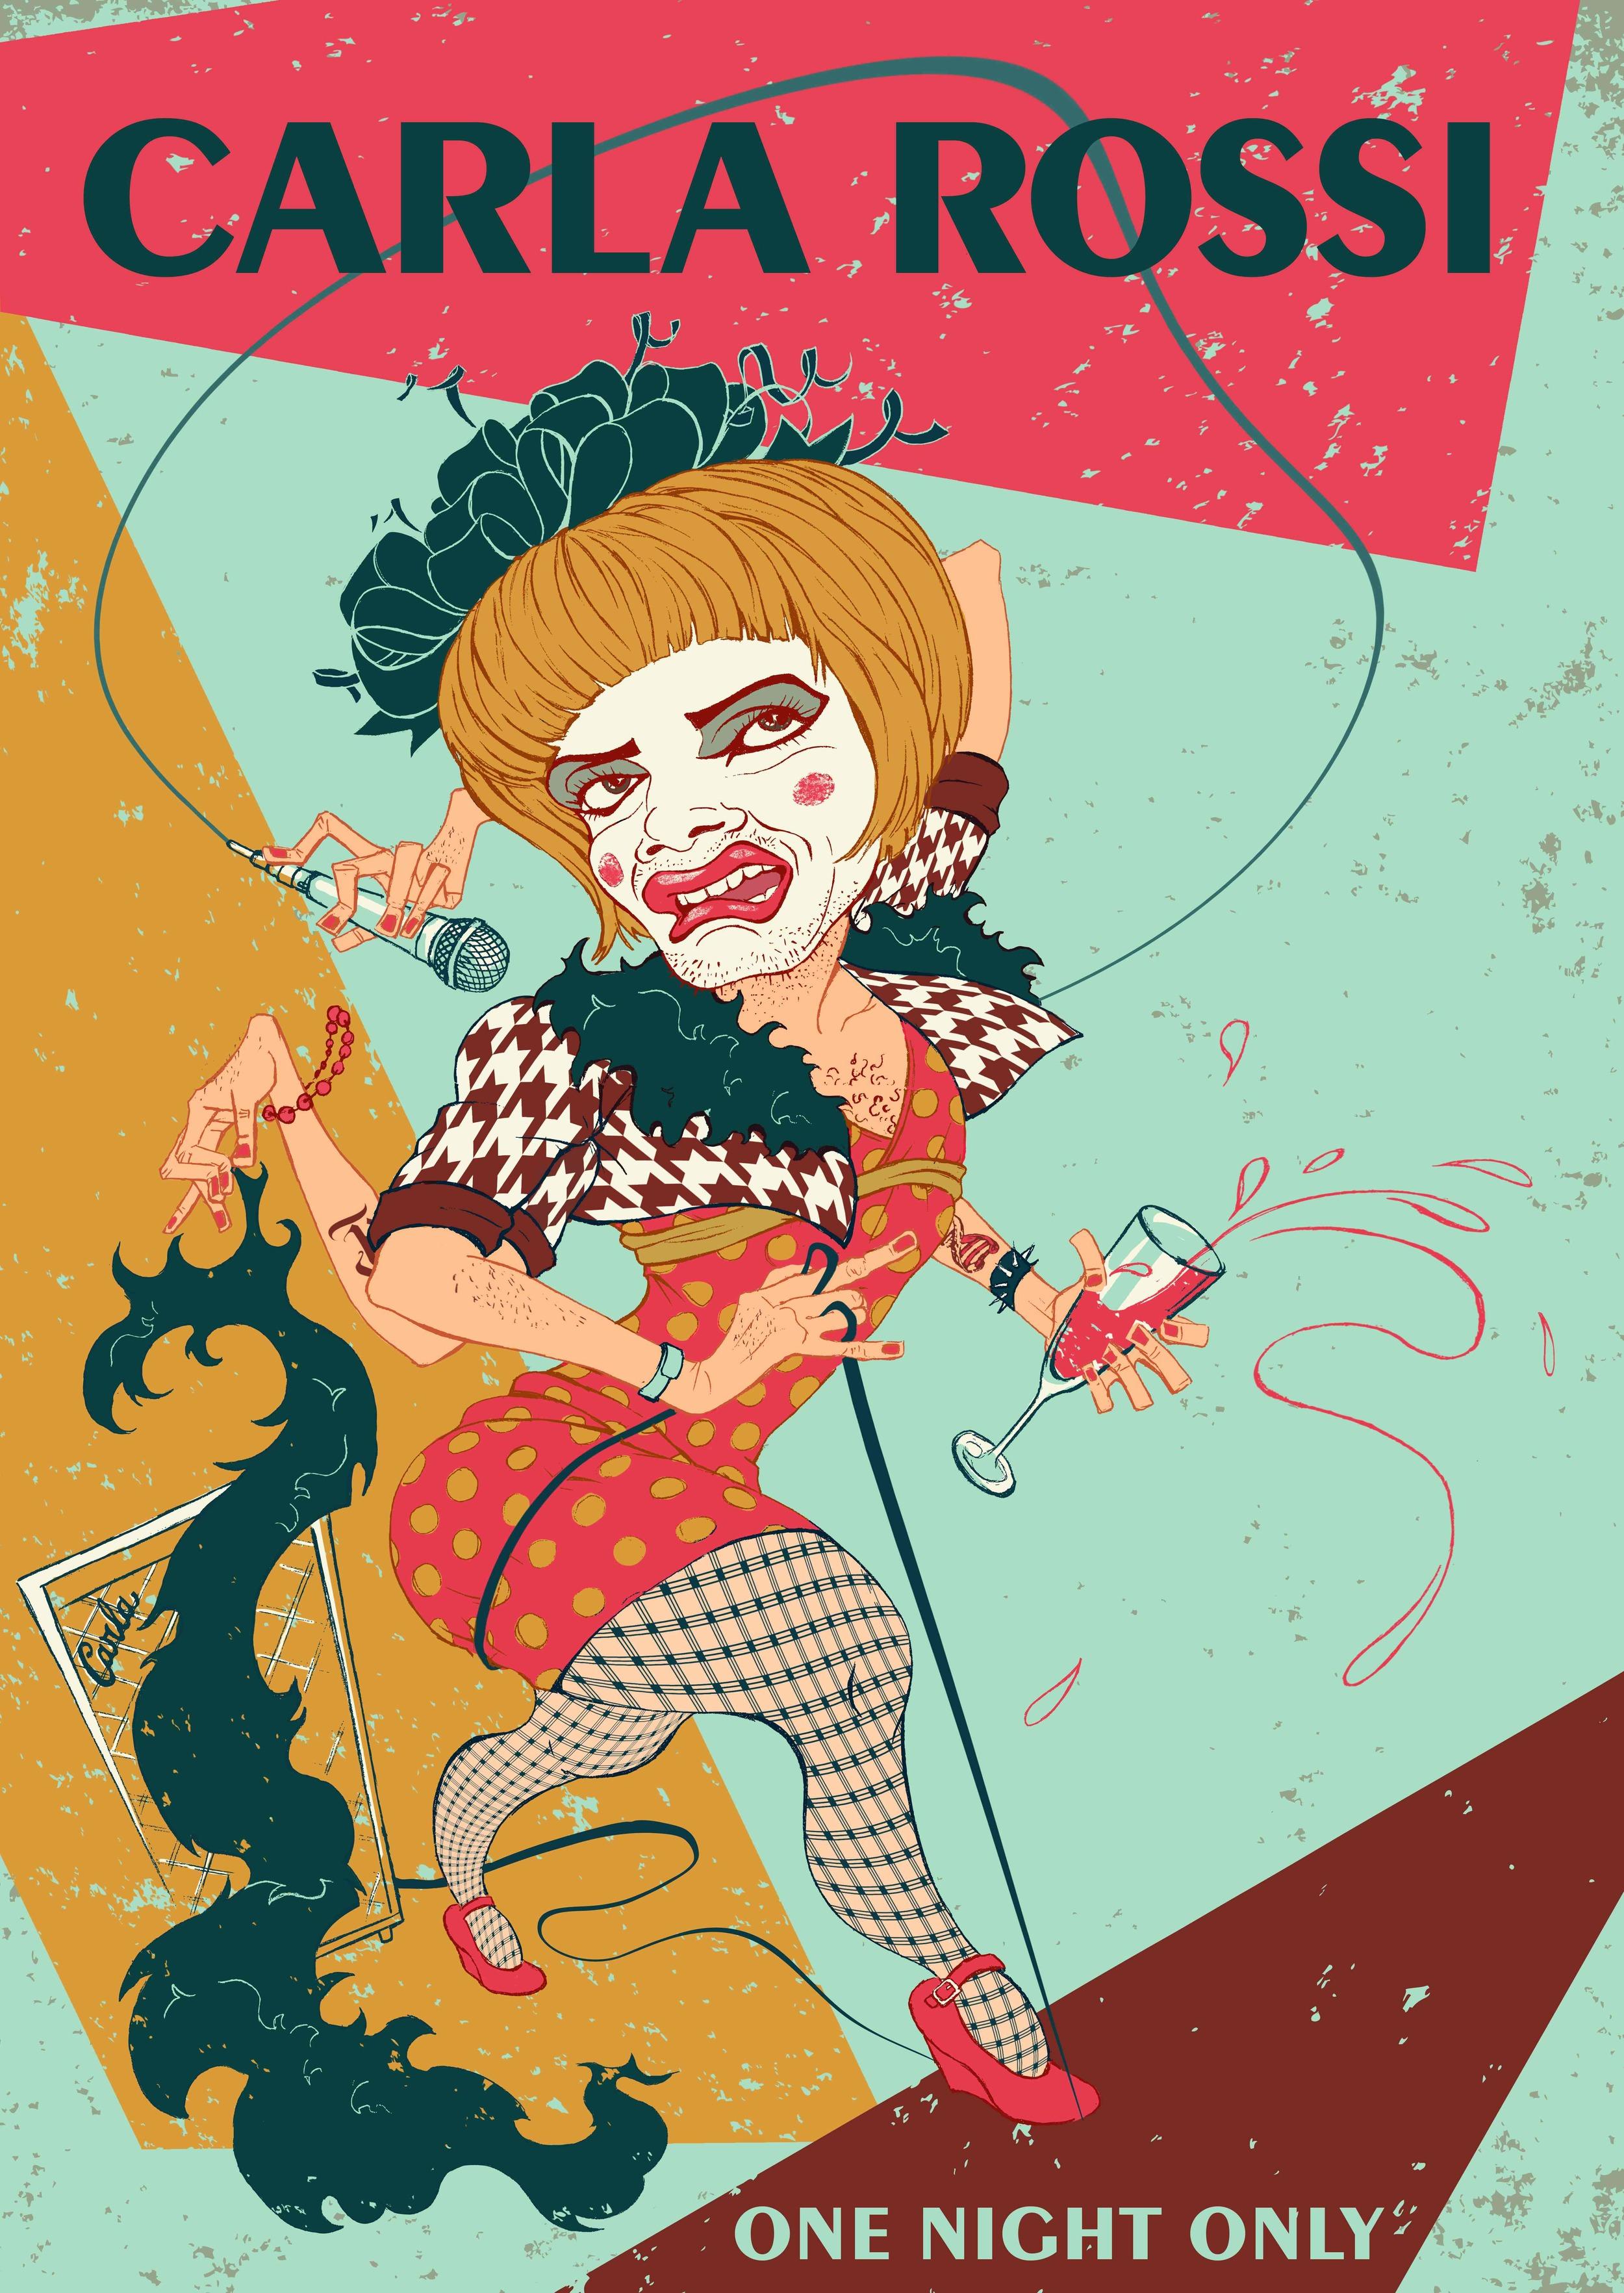 Illustration by Matty Newton